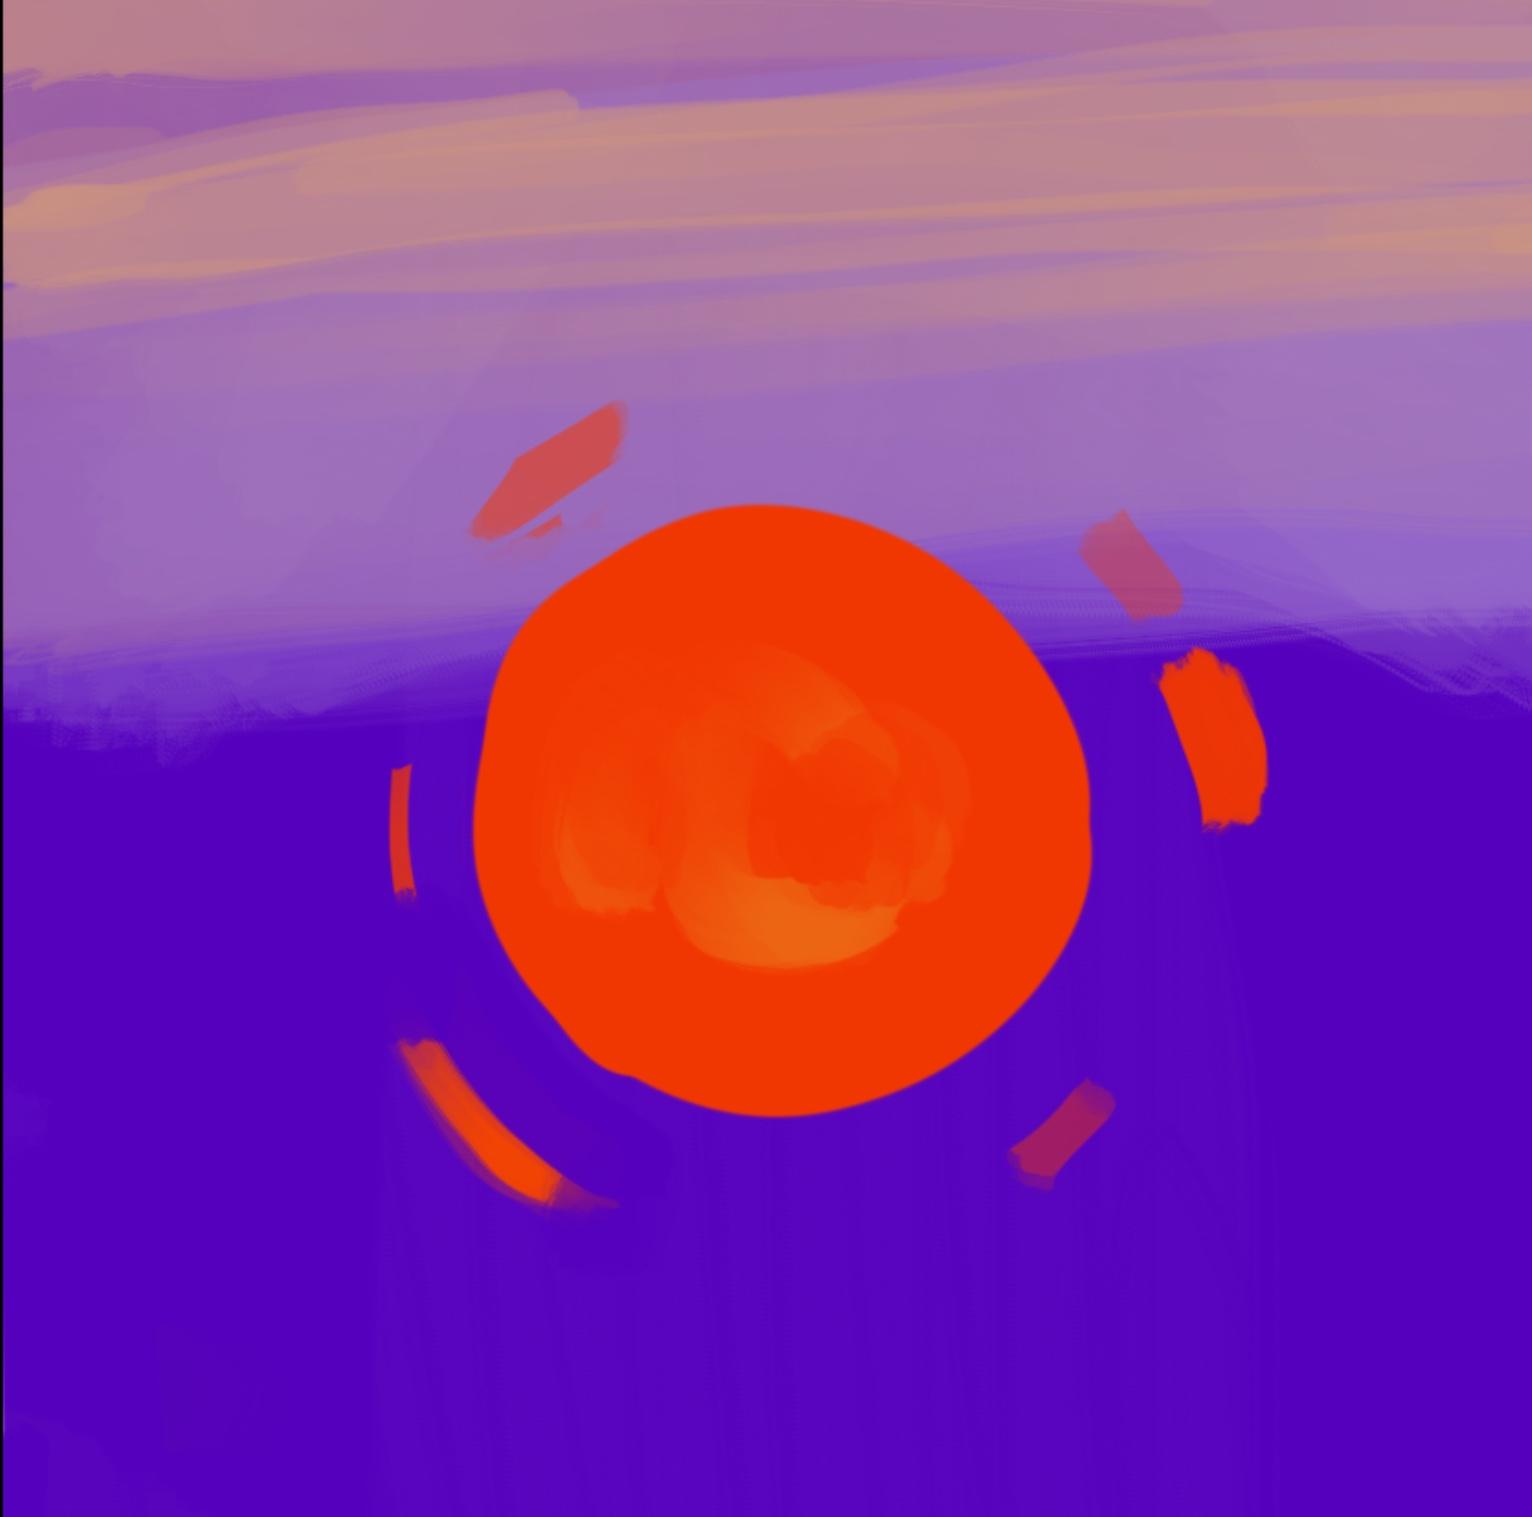 Tilted_Sun_Character_The_Orb.jpg